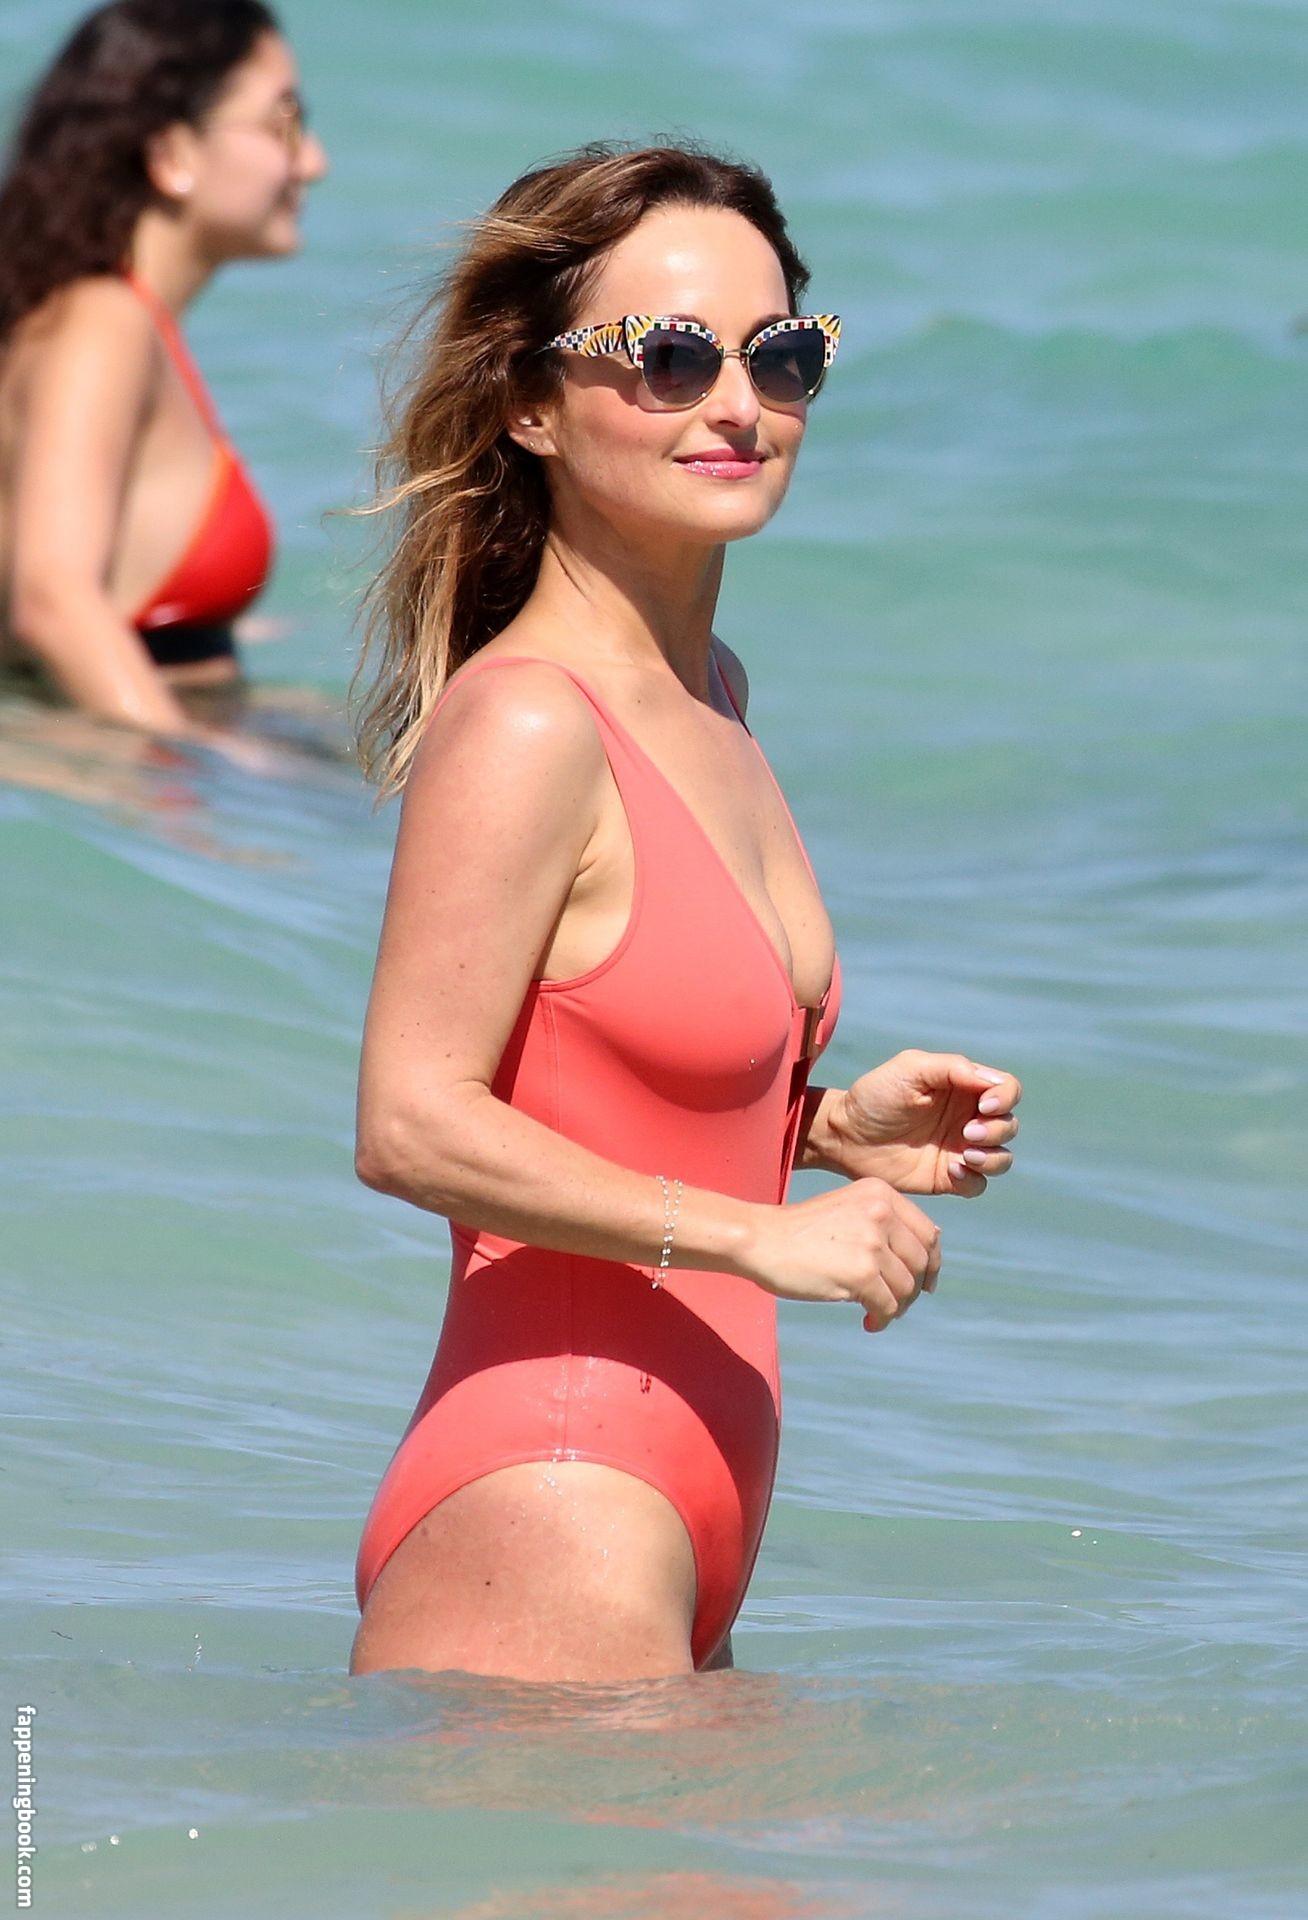 Giada De Laurentiis Nude, Sexy, The Fappening, Uncensored - Photo #1104213 - FappeningBook